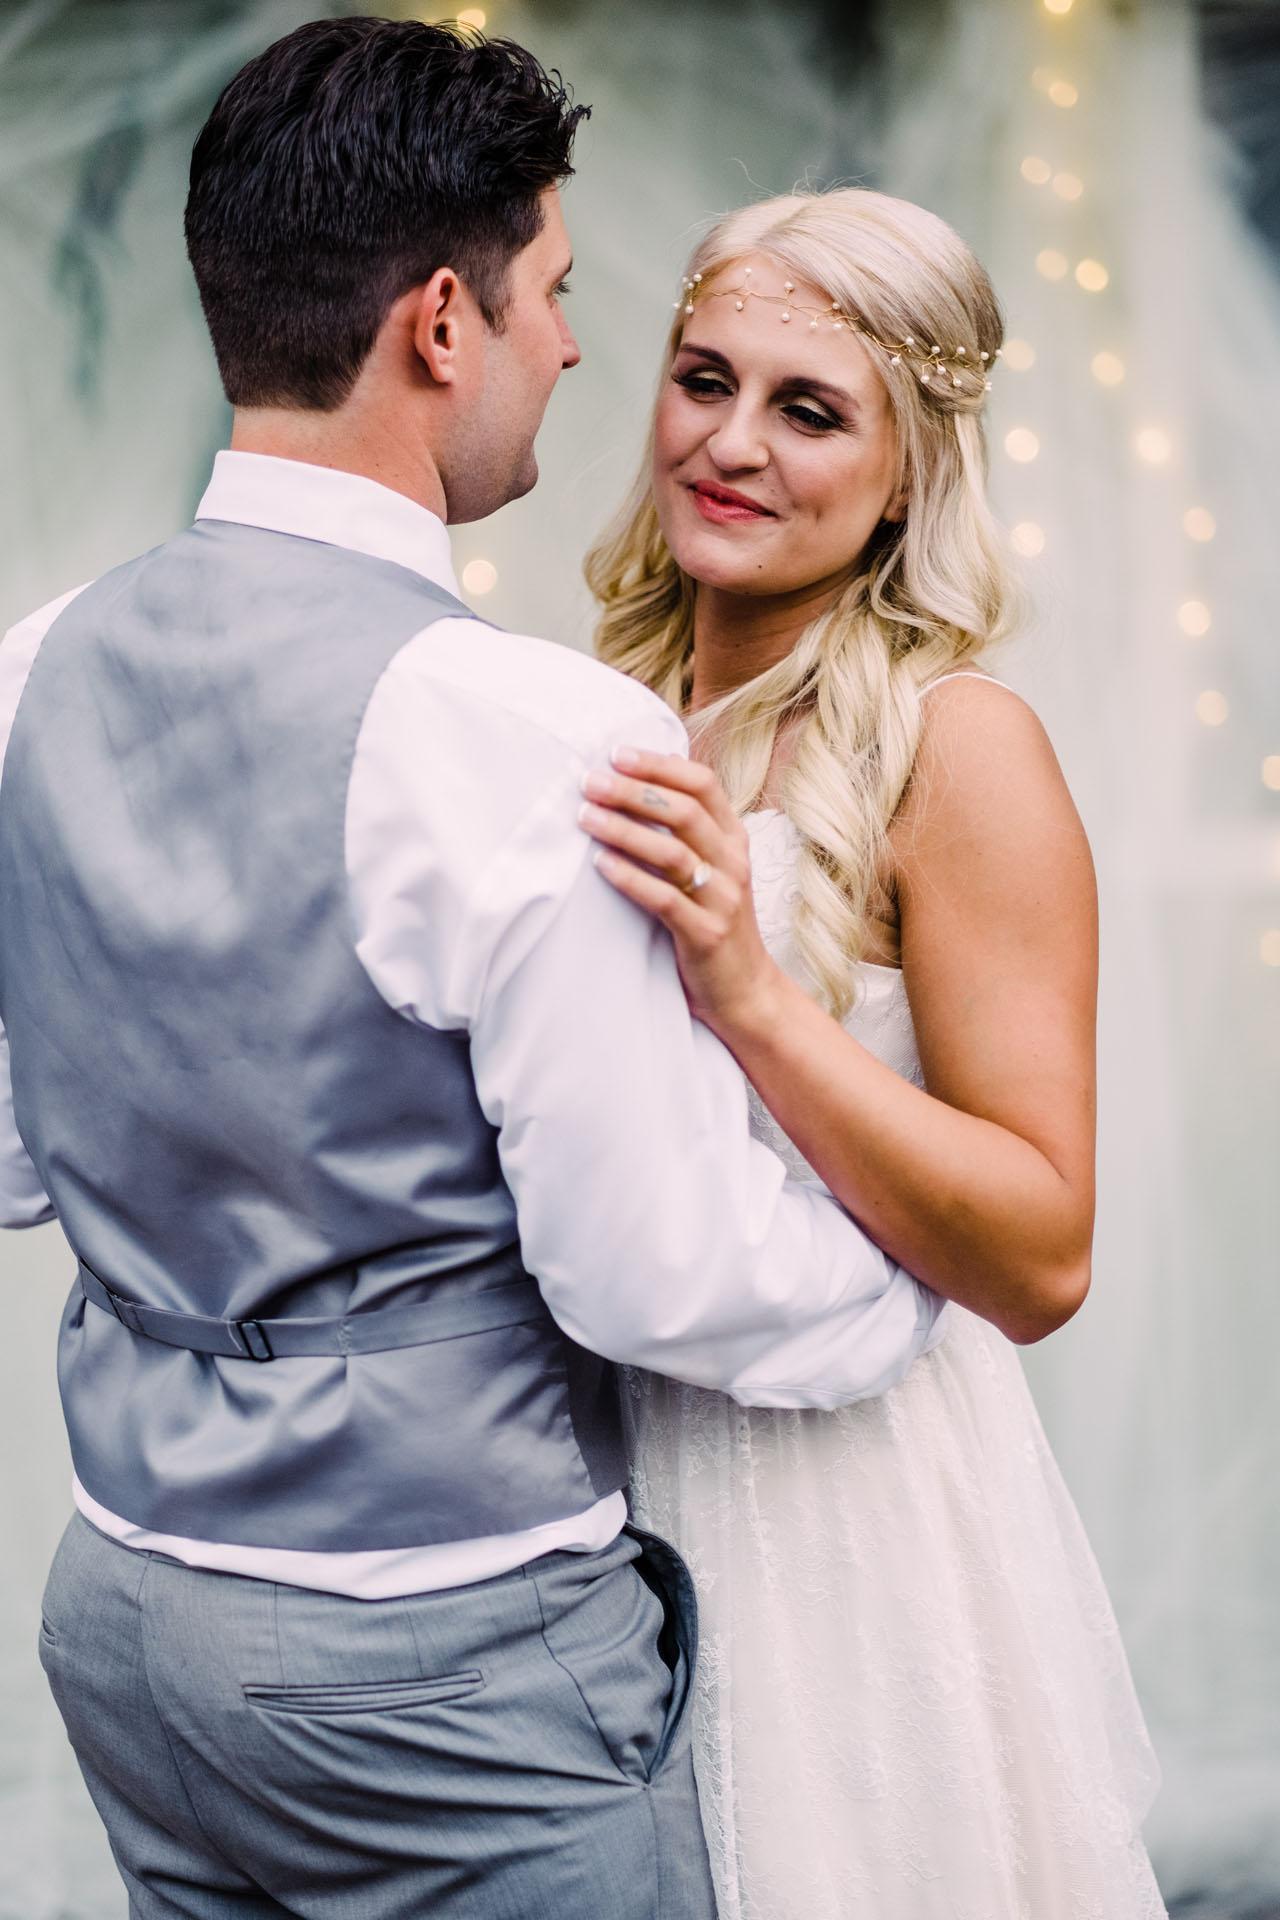 10-7-17 Devon and Jordan's Wedding-214.jpg